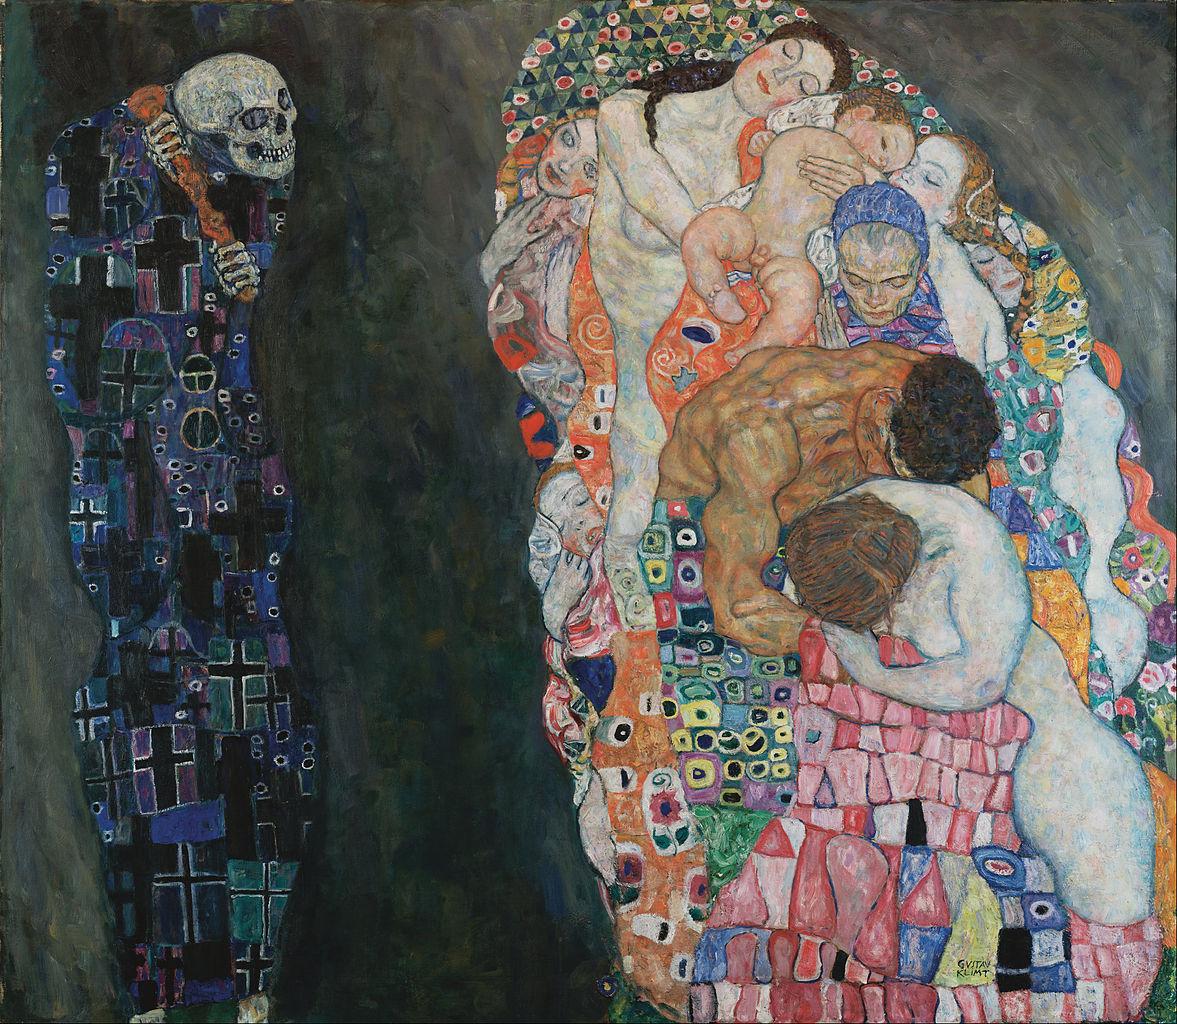 http://upload.wikimedia.org/wikipedia/commons/thumb/1/18/Gustav_Klimt_-_Death_and_Life_-_Google_Art_Project.jpg/1177px-Gustav_Klimt_-_Death_and_Life_-_Google_Art_Project.jpg